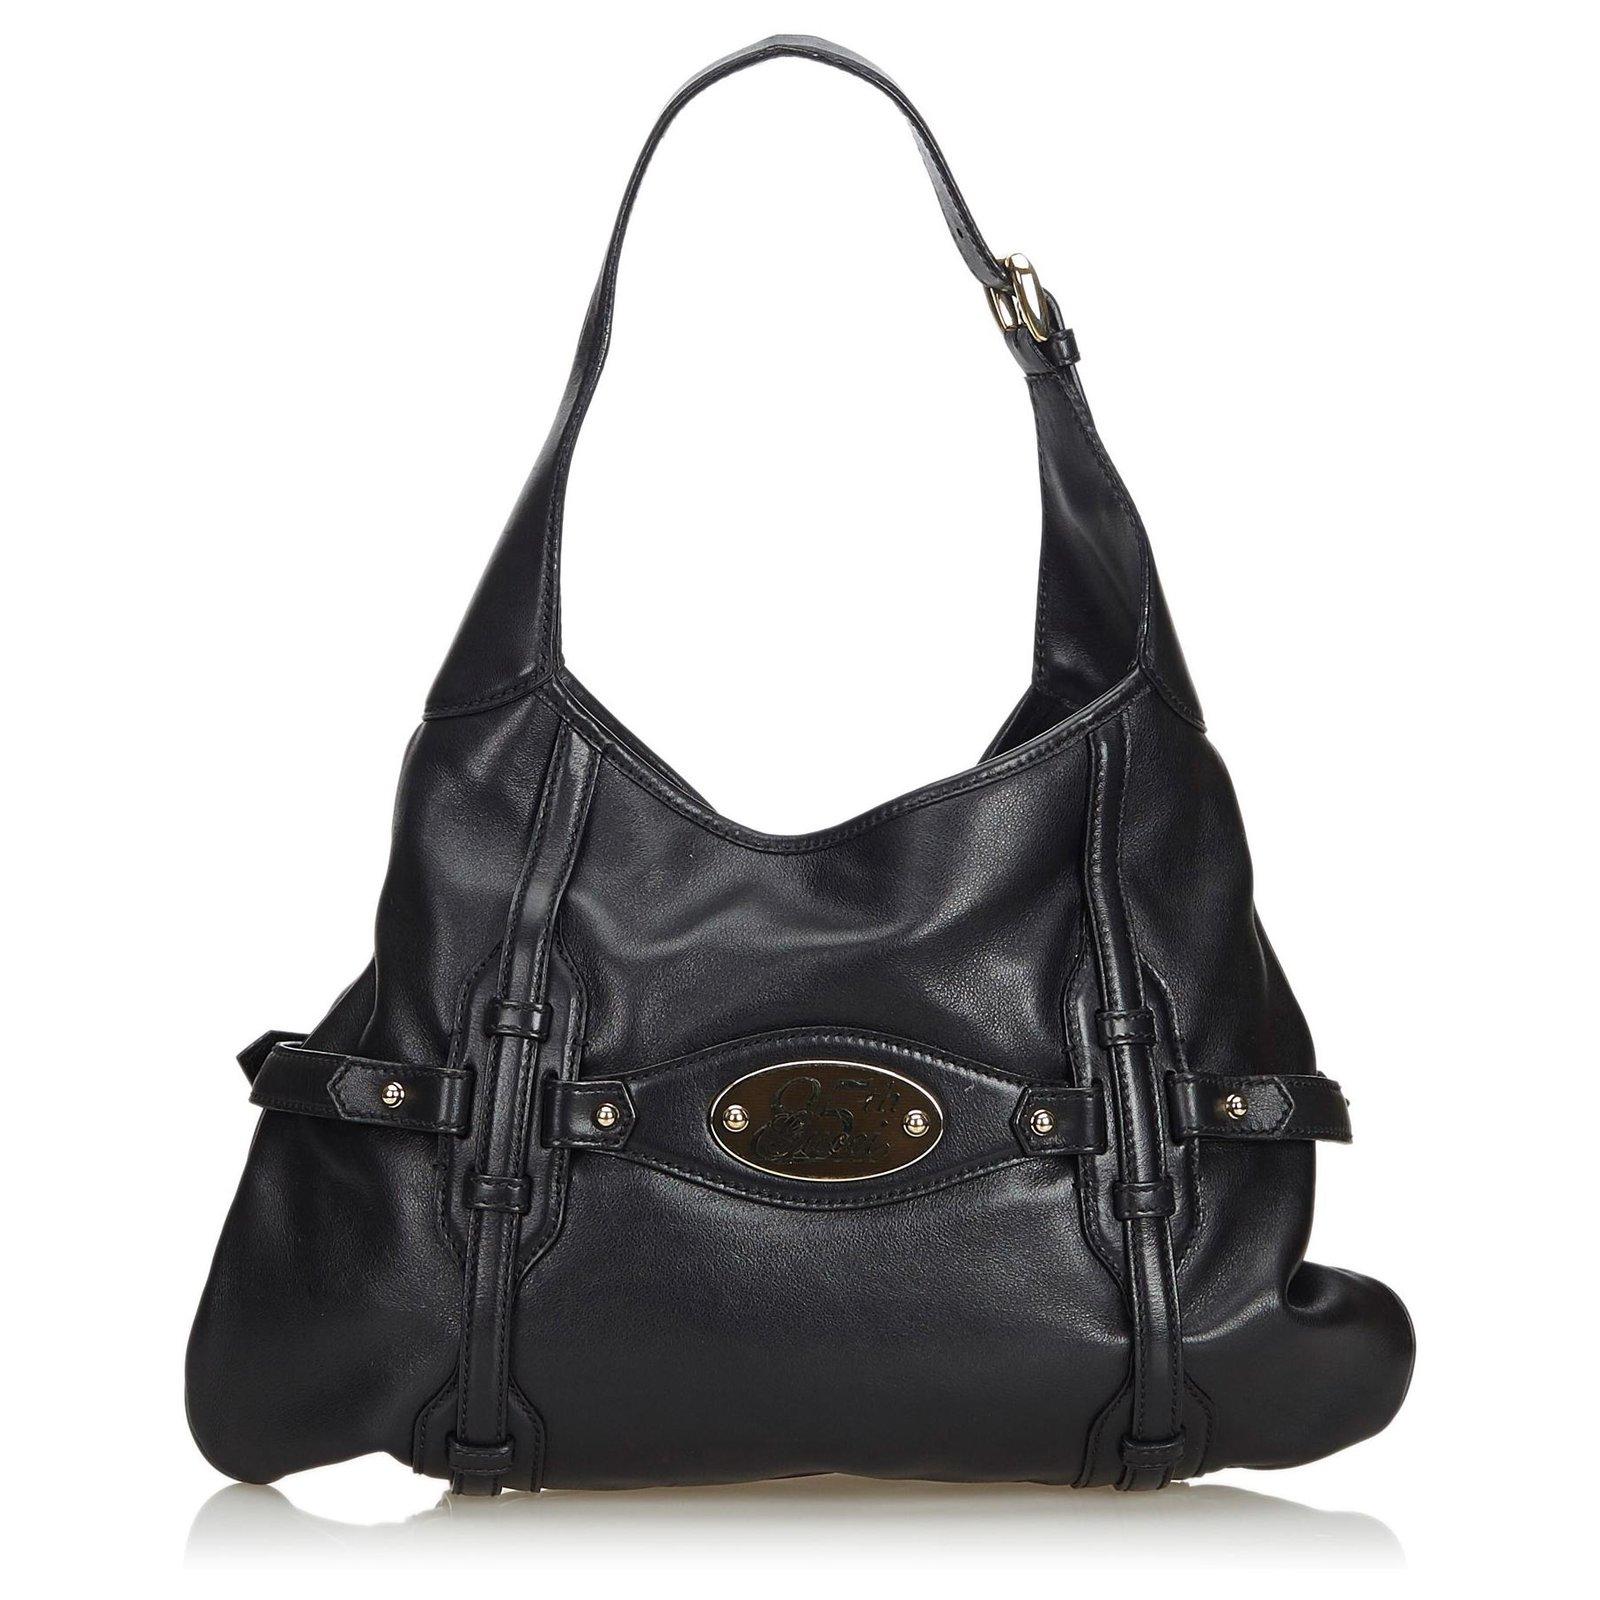 08004b328 Gucci Gucci Black 85th Anniversary Horsebit Leather Hobo Bag Handbags  Leather,Other,Metal Black ref.129987 - Joli Closet